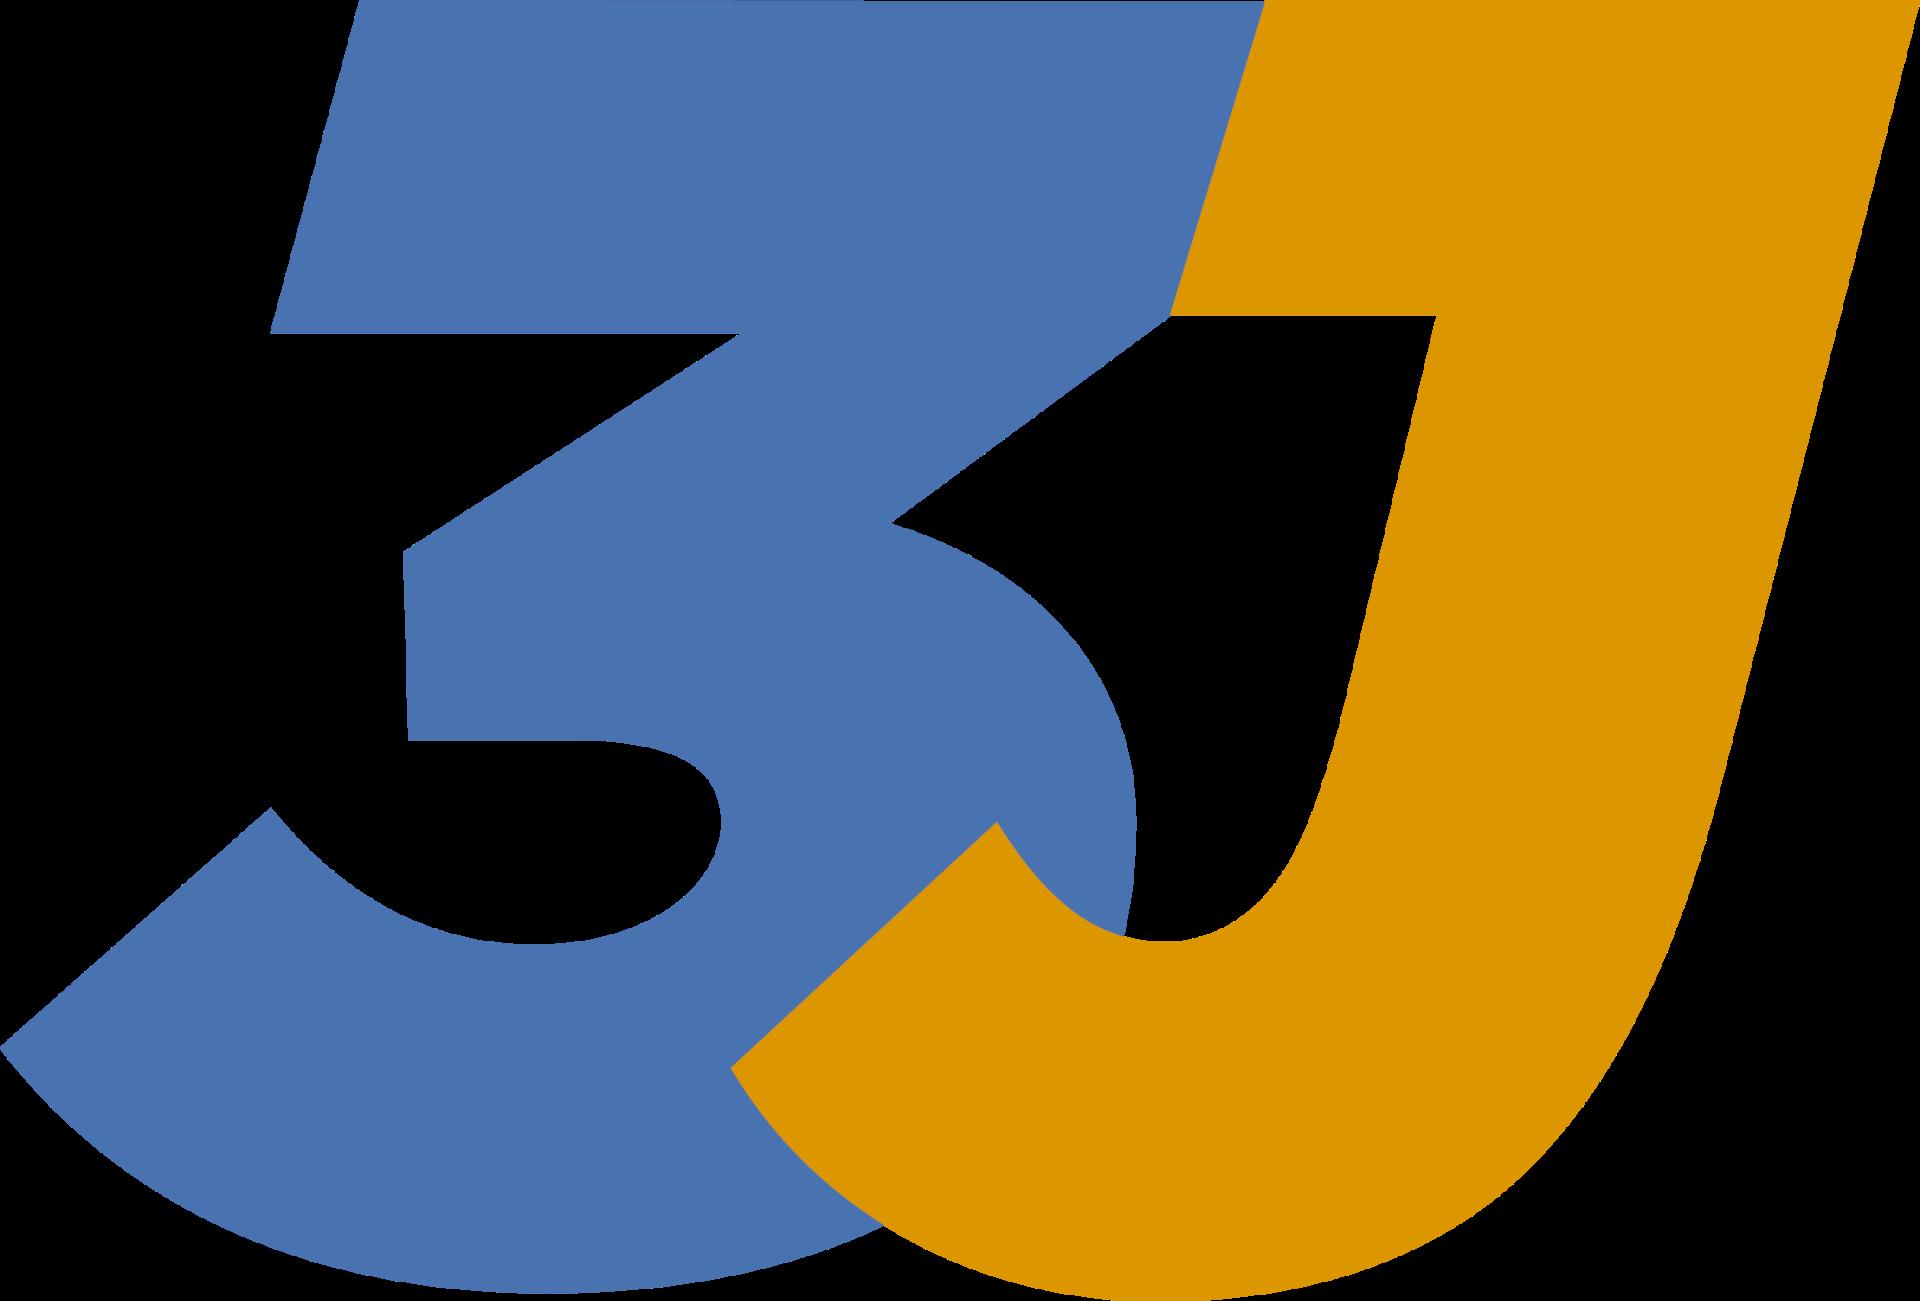 3J S.C.I.